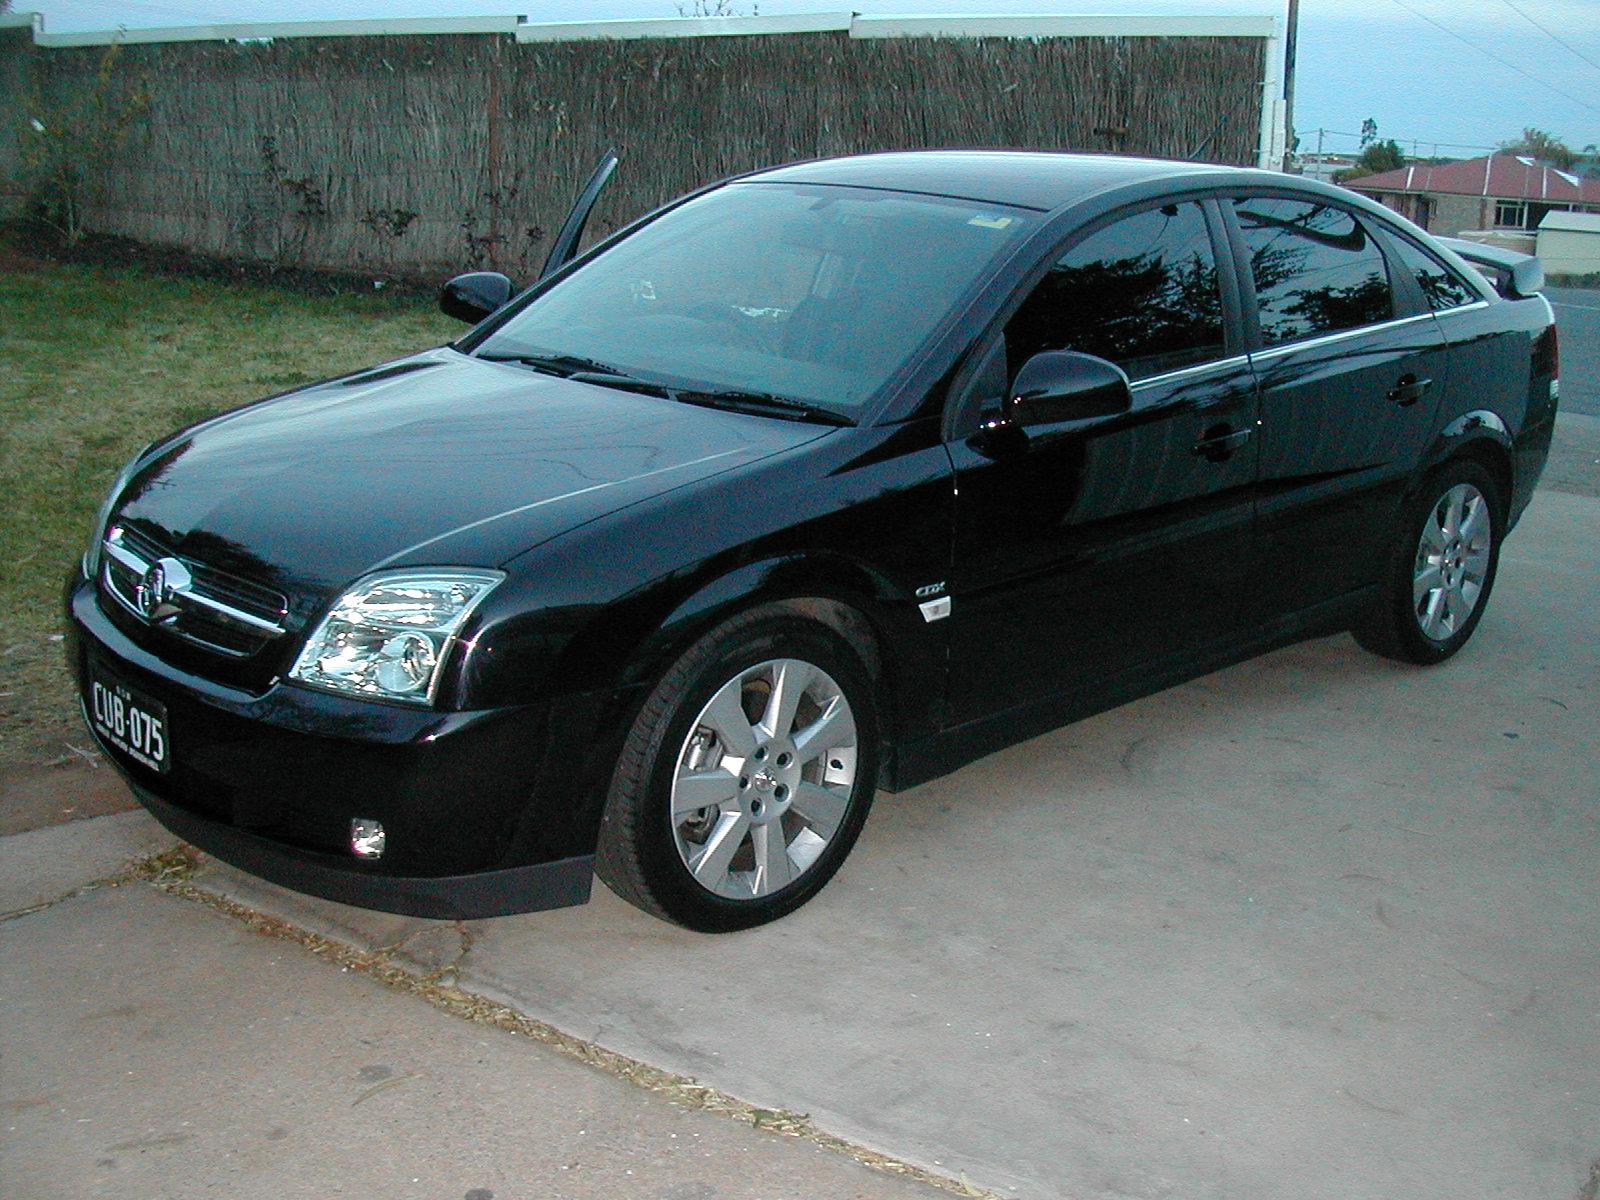 2006 Opel Vectra Pictures CarGurus